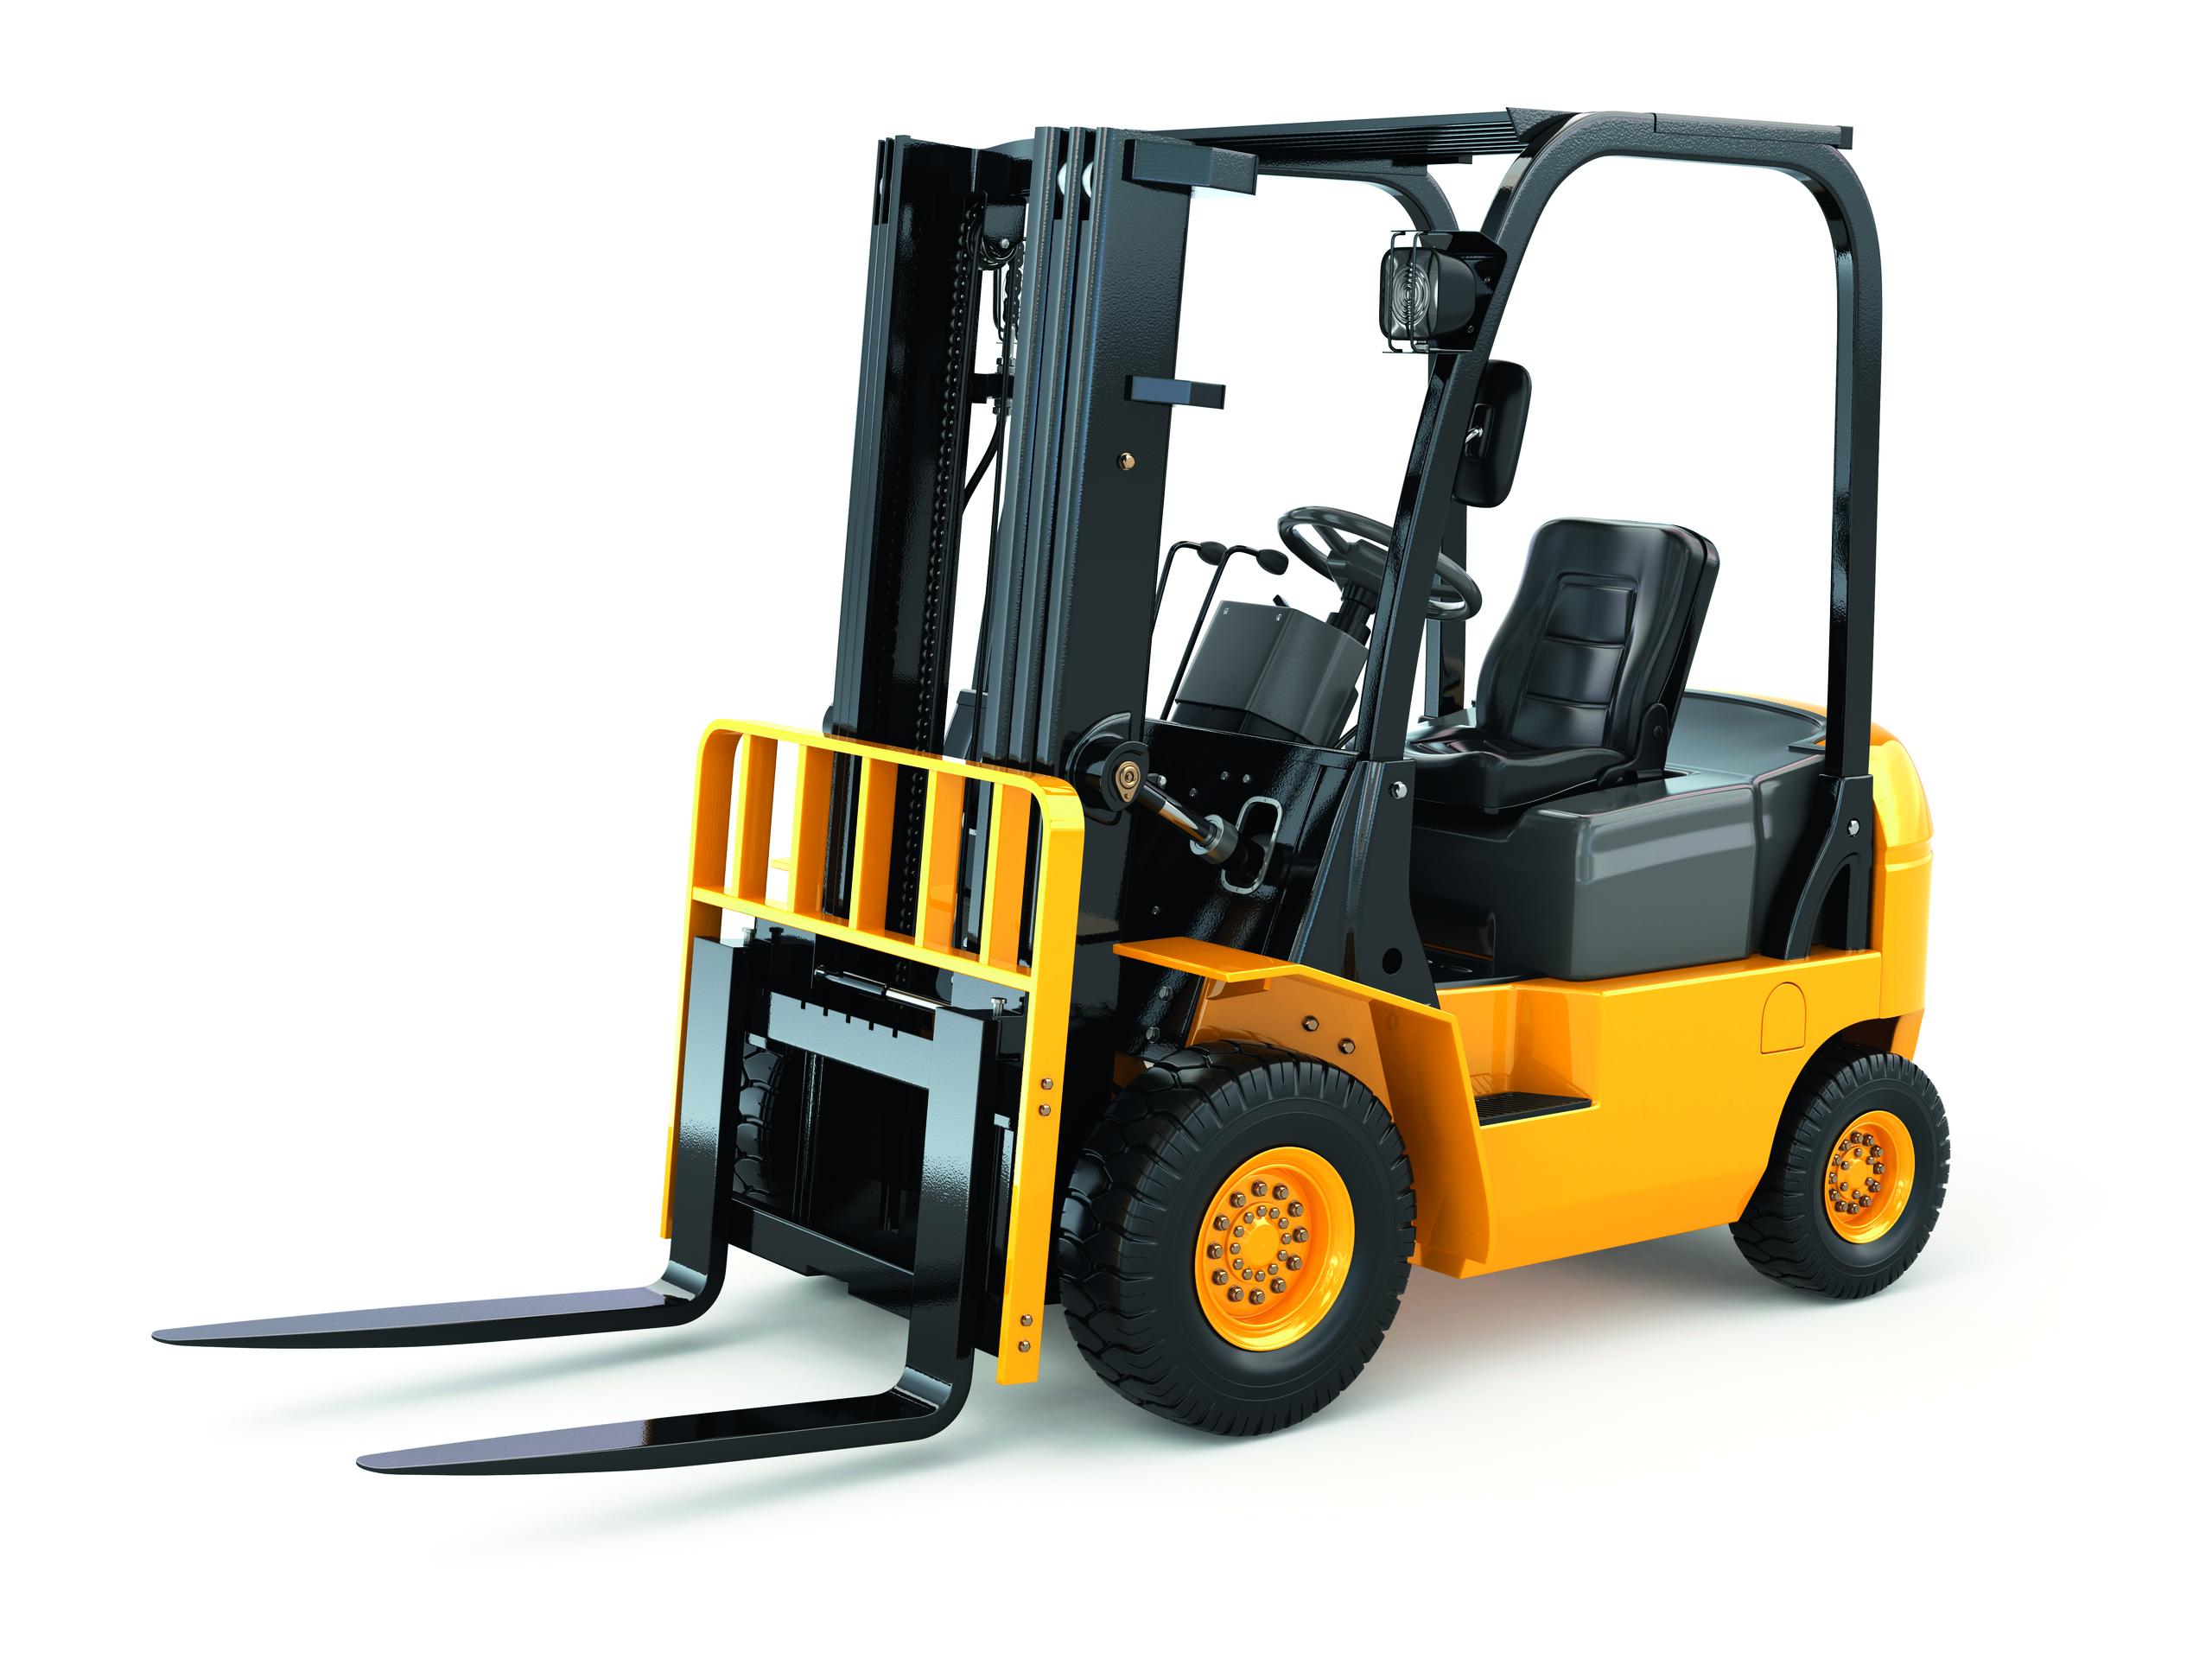 Free photo: Forklift Truck - Cartoon, Forklift, Industrial ...